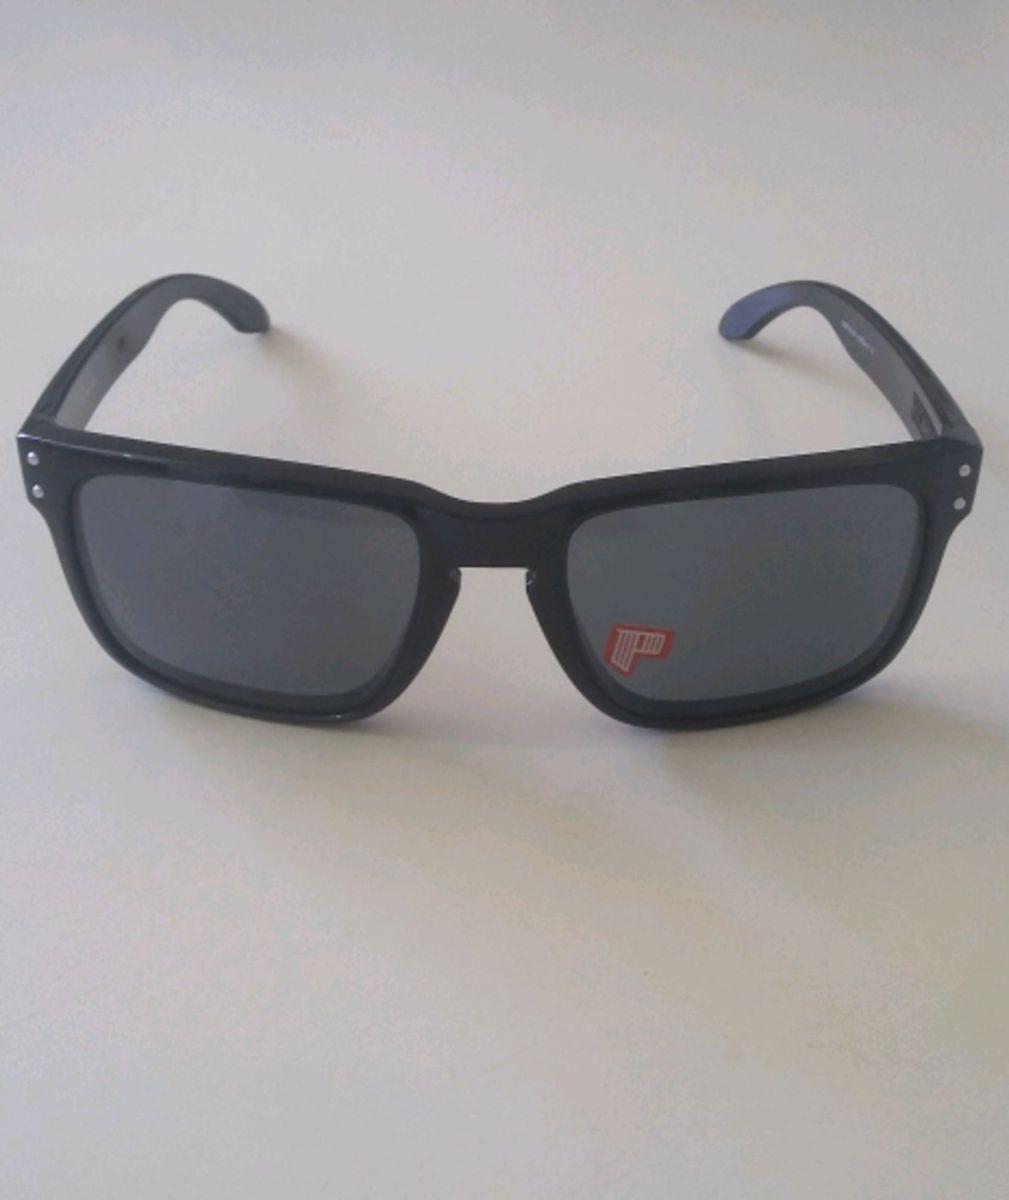 óculos oakley holbrook preto - óculos oakley.  Czm6ly9wag90b3muzw5qb2vplmnvbs5ici9wcm9kdwn0cy80otk3ndu0l2m2mtu4yzk0mtyymzm1mgy4oty3nwvjnwu5yzdjyzkzlmpwzw  ... 4b8e57724b